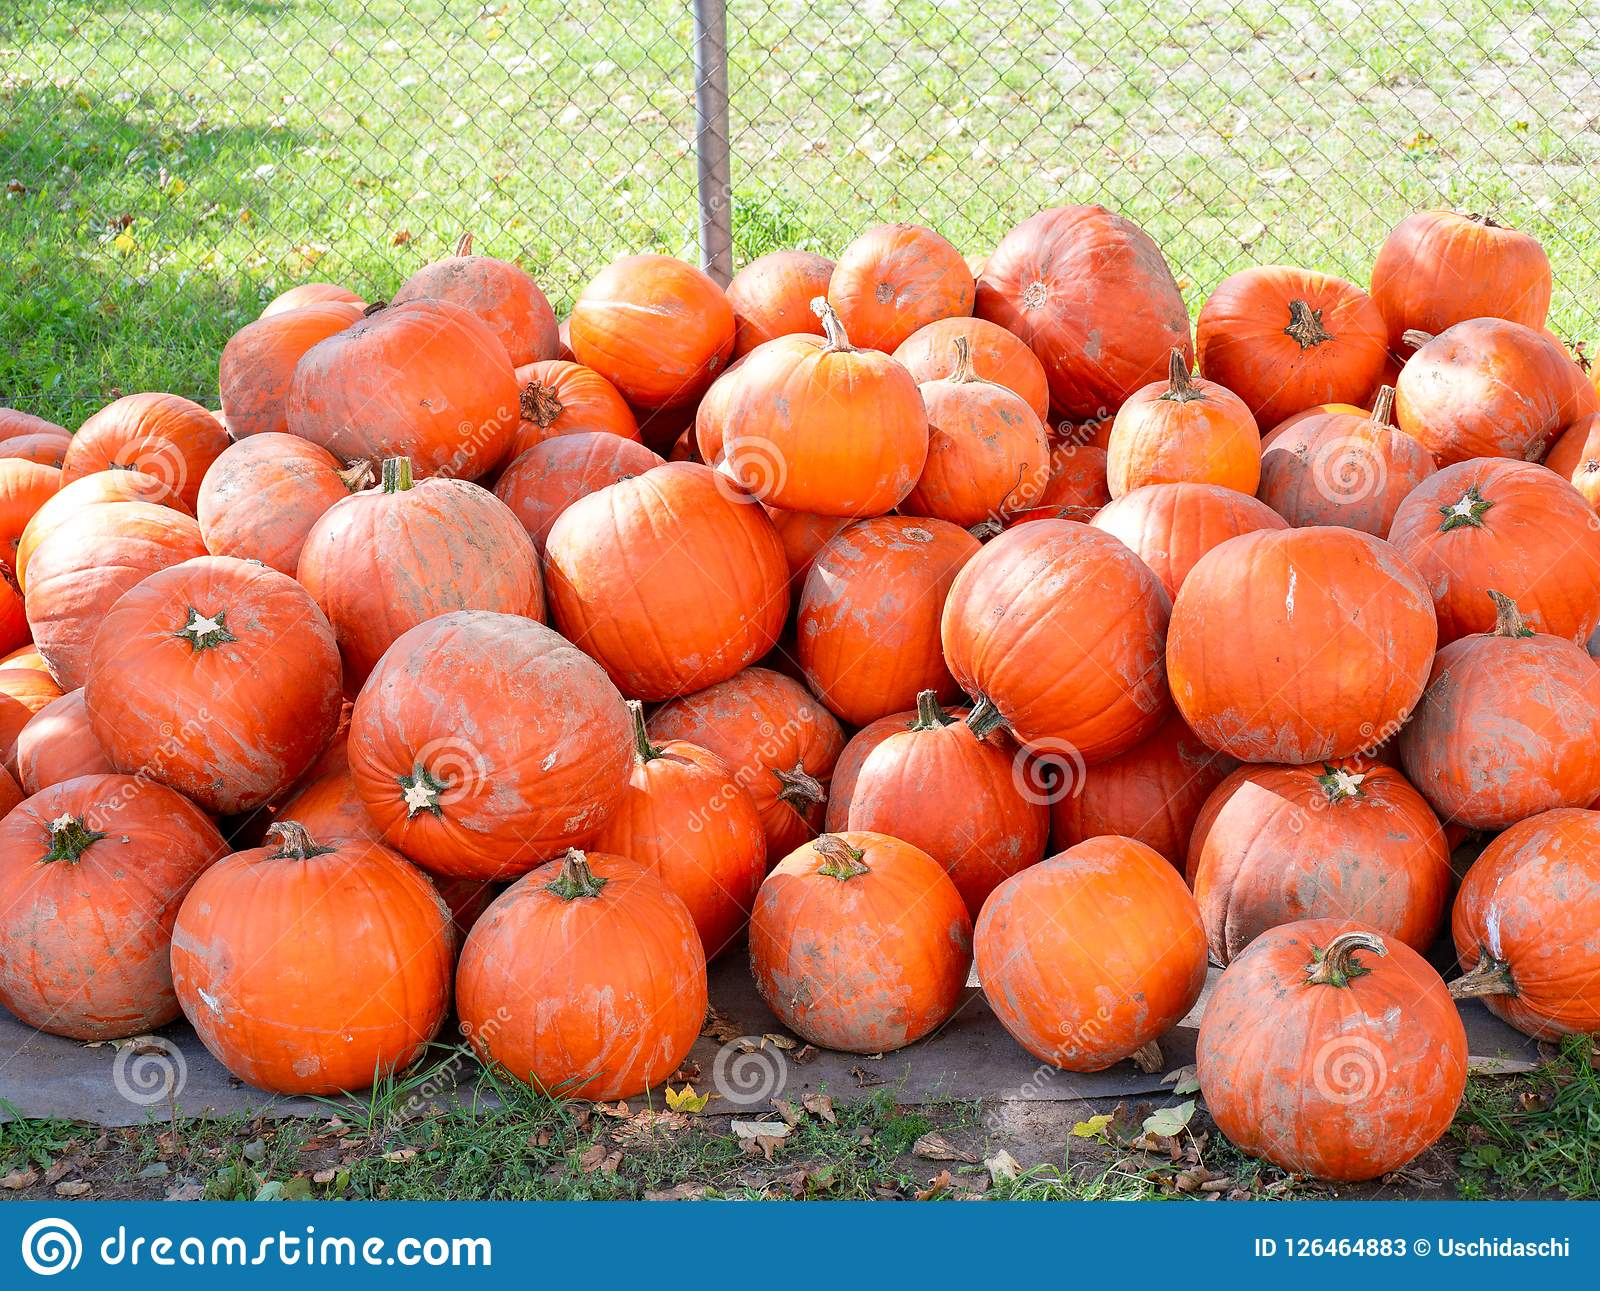 Image of a pile of dirty orange pumpkins